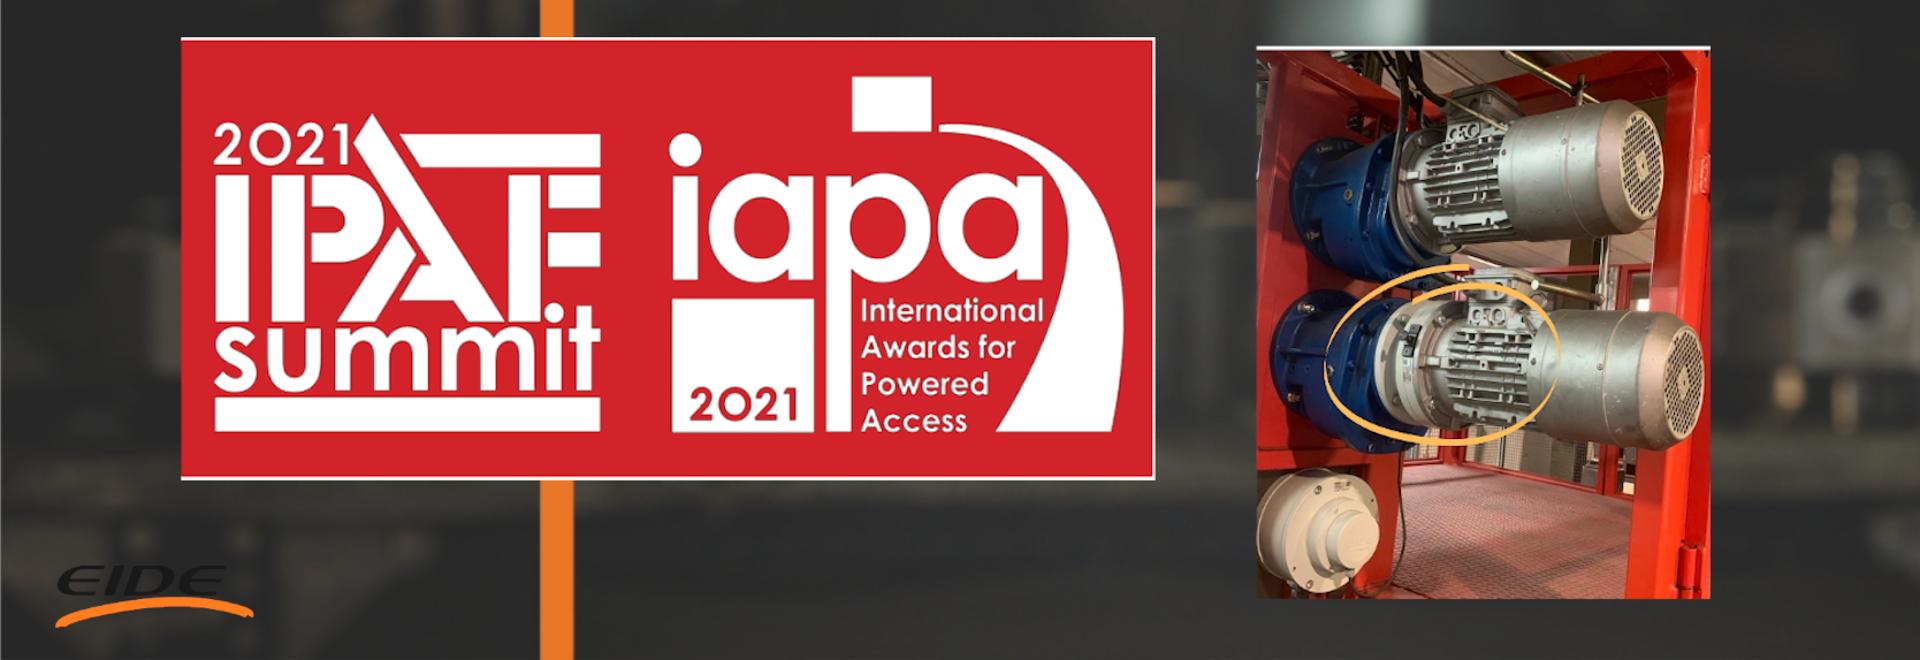 DBQ CENTRIFUGAL BRAKE NOMINATED IN THE IAPA AWARDS 2021